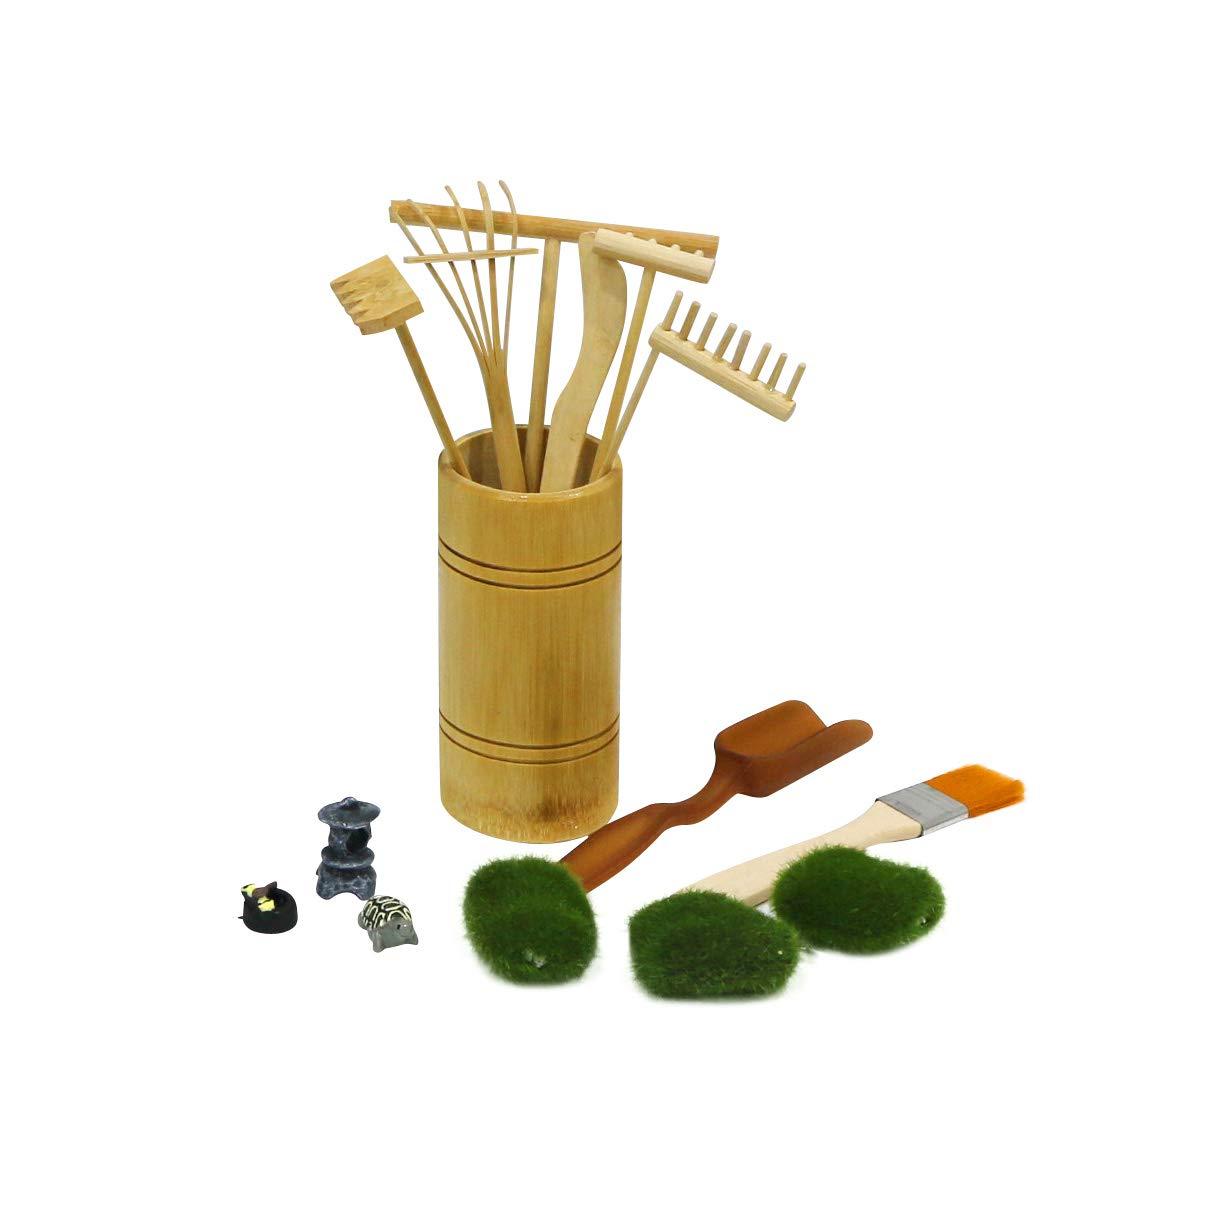 BangBangDa Mini Zen Garden Rake Tool - Tabletop Meditation Rock Sand Garden Kits with Moss Rakes Brusher Spoon Figurines Holder